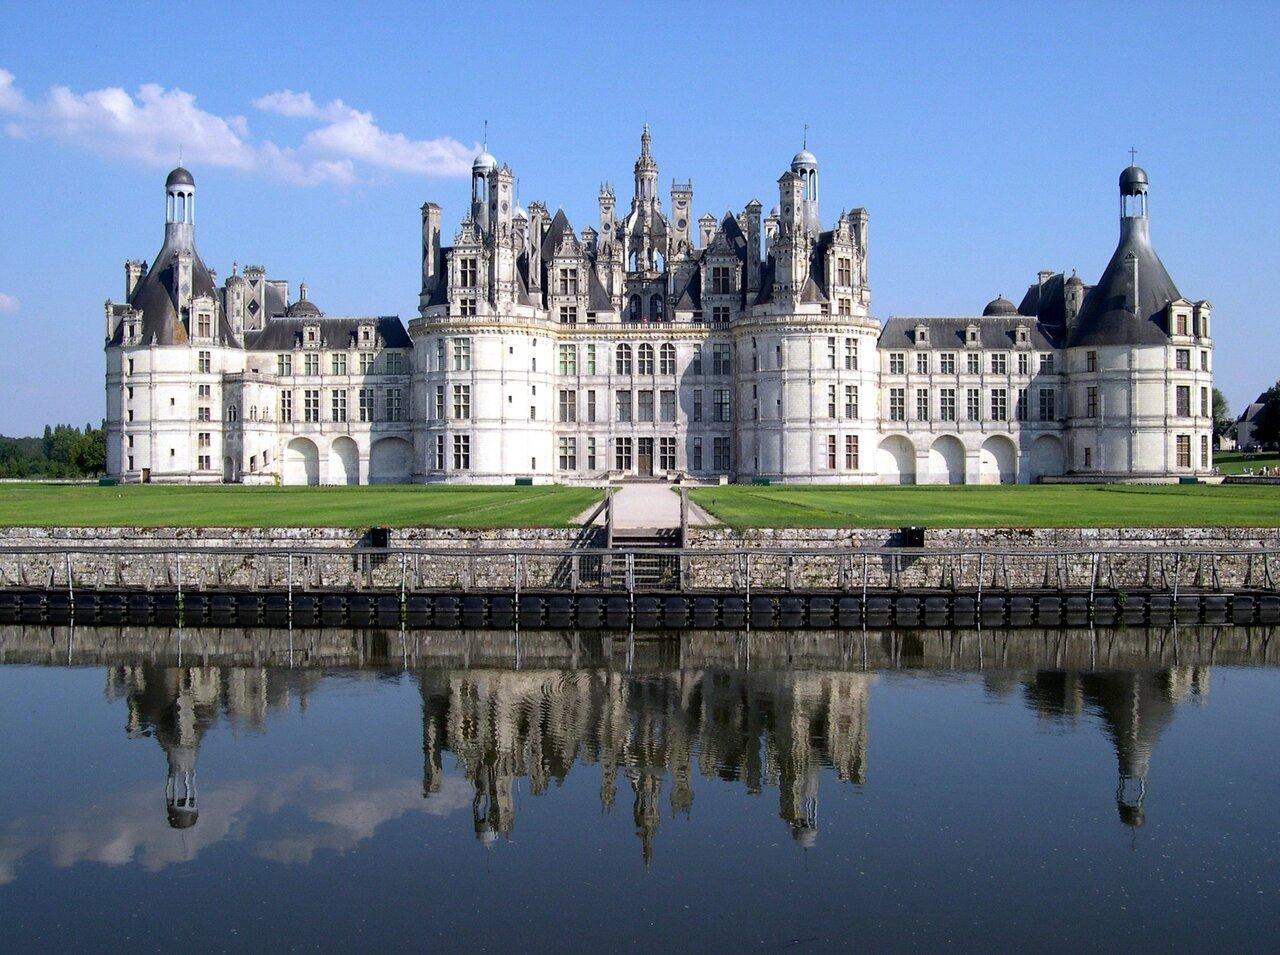 France_Loir-et-Cher_Chambord_Chateau_03.jpg